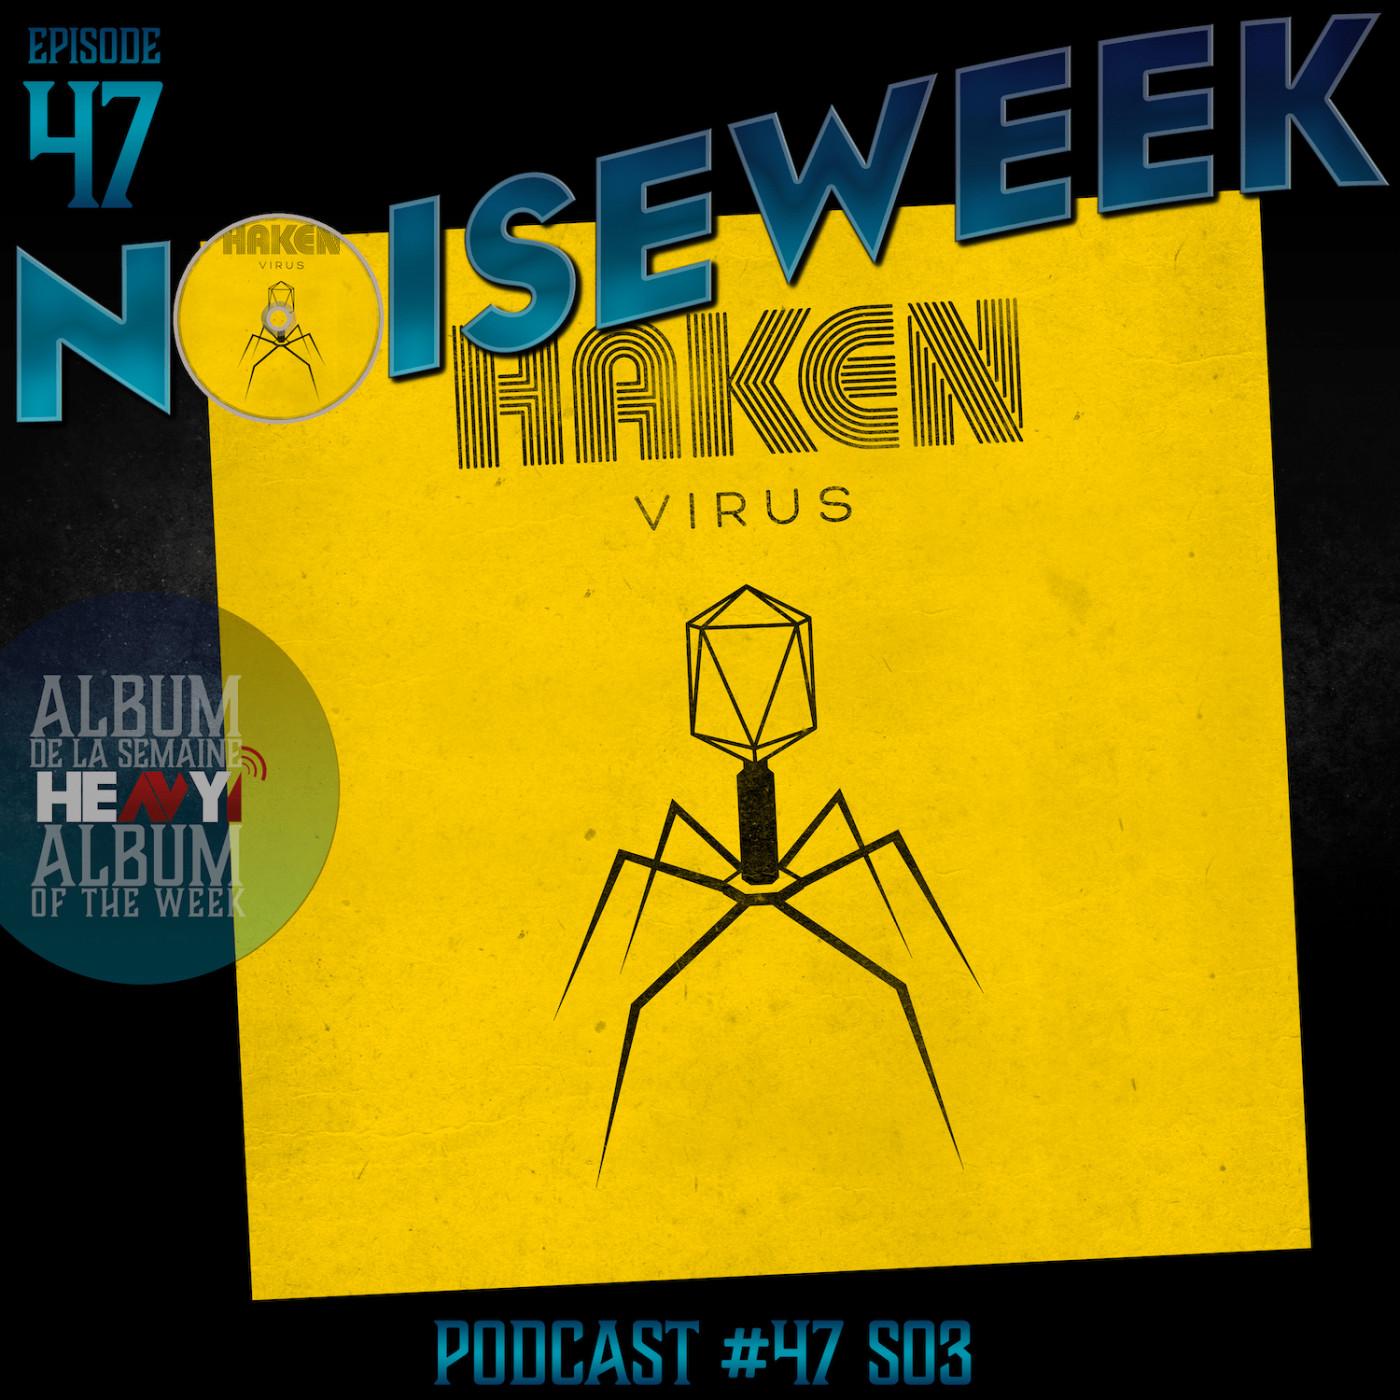 Noiseweek #47 Saison 3